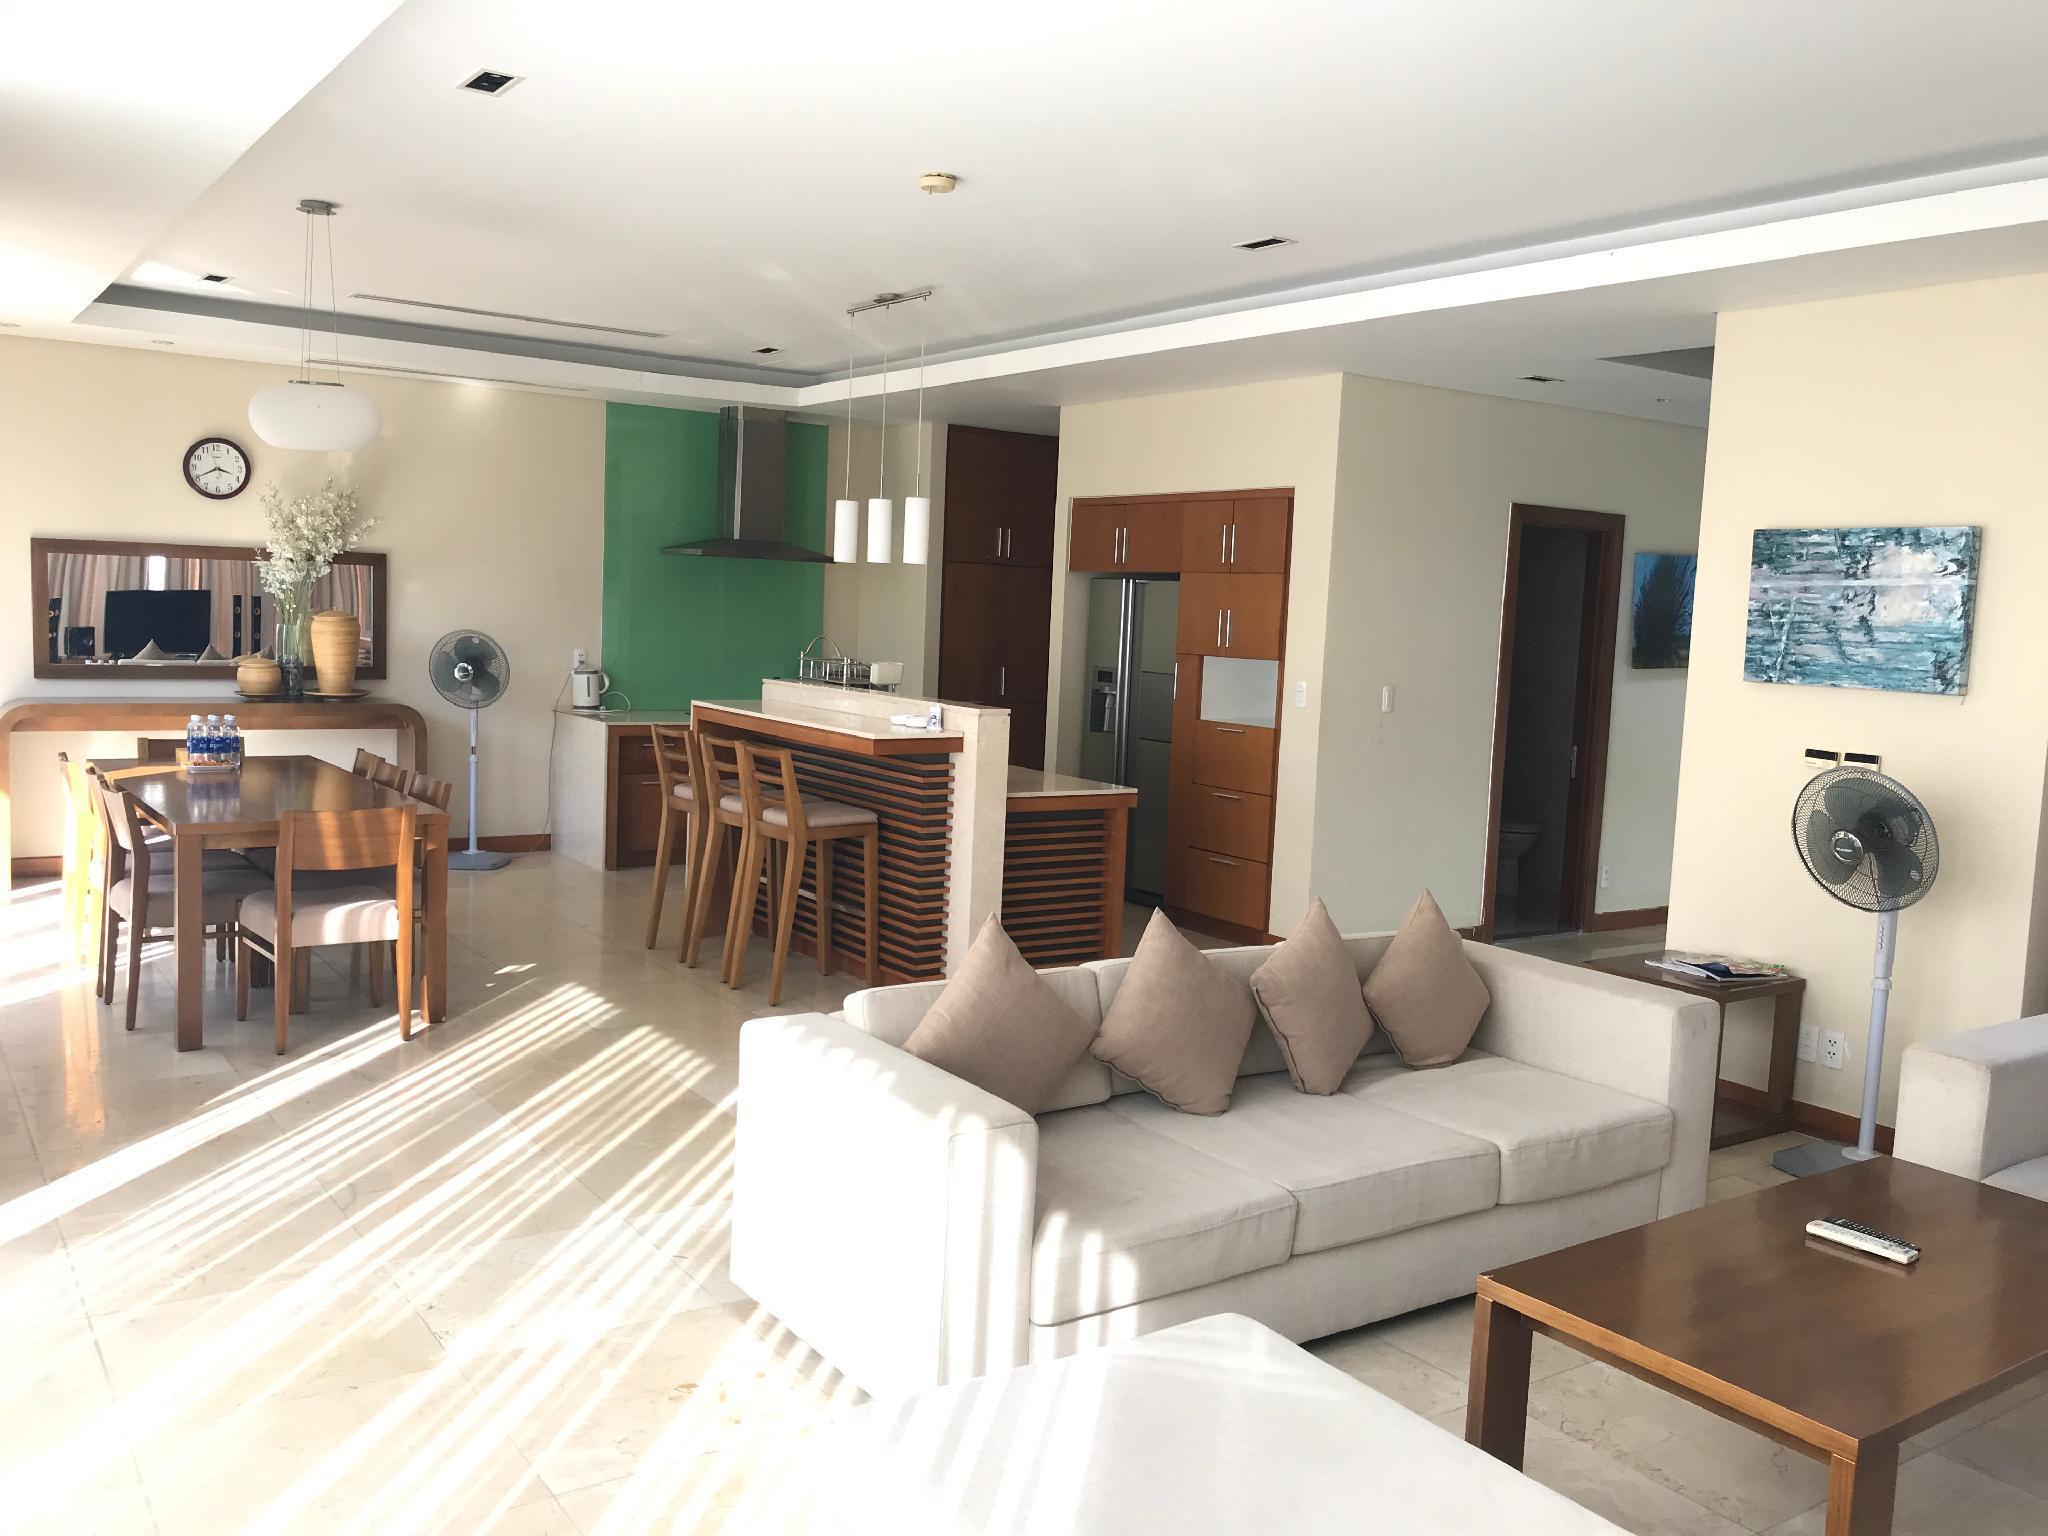 4 BedRooms Villas At Da Nang Beach